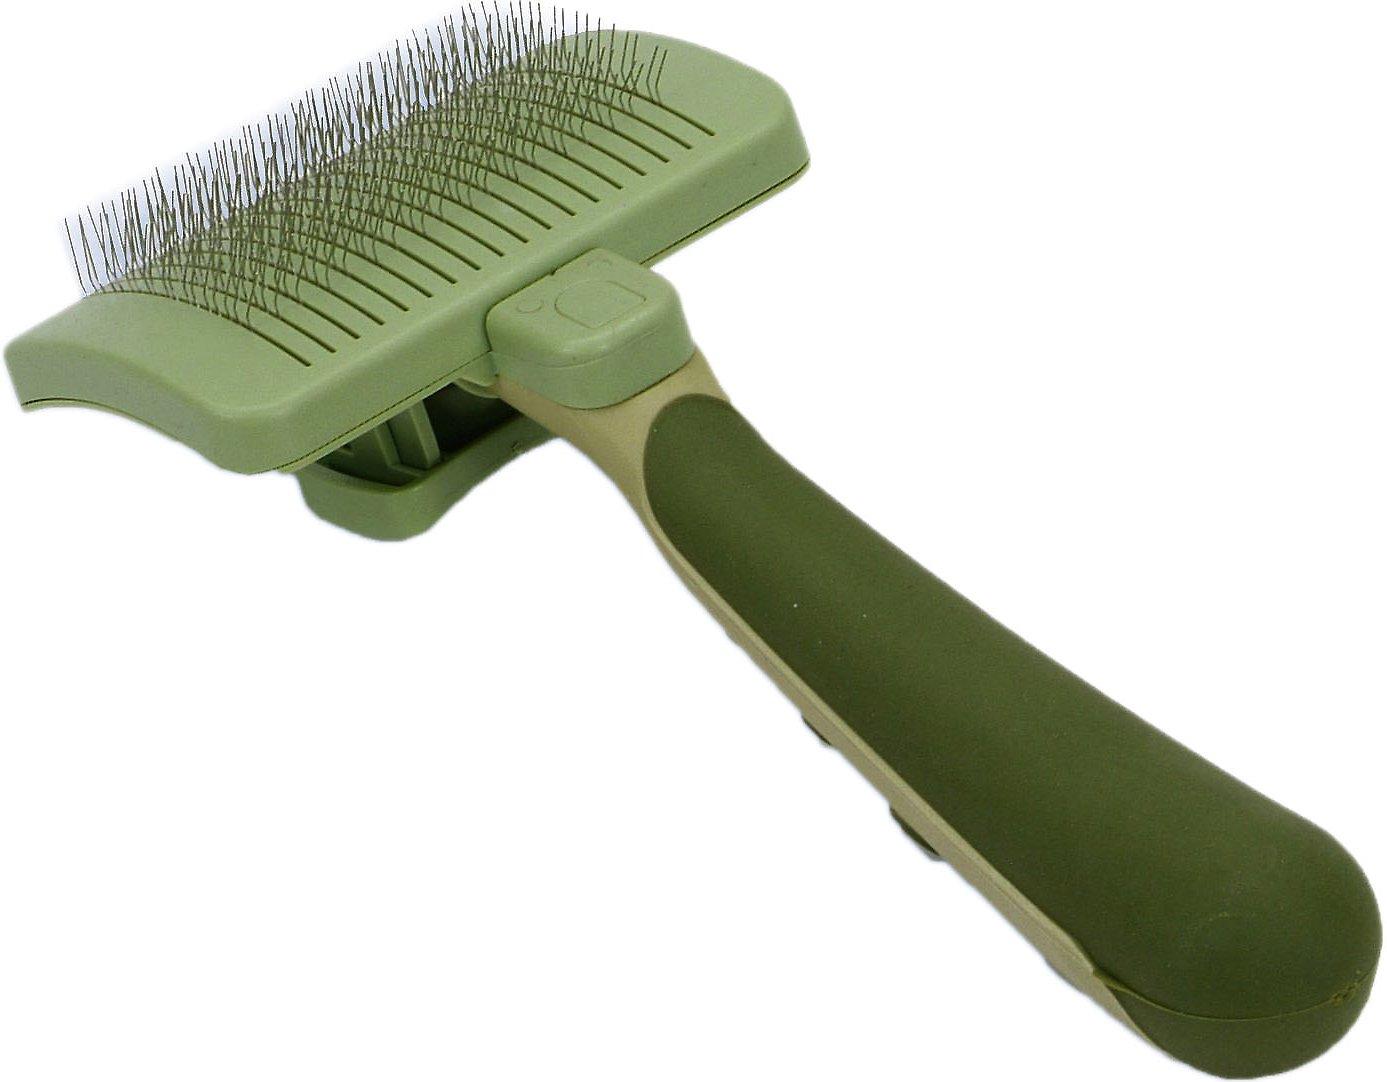 Safari Self-Cleaning Slicker Brush for Cats